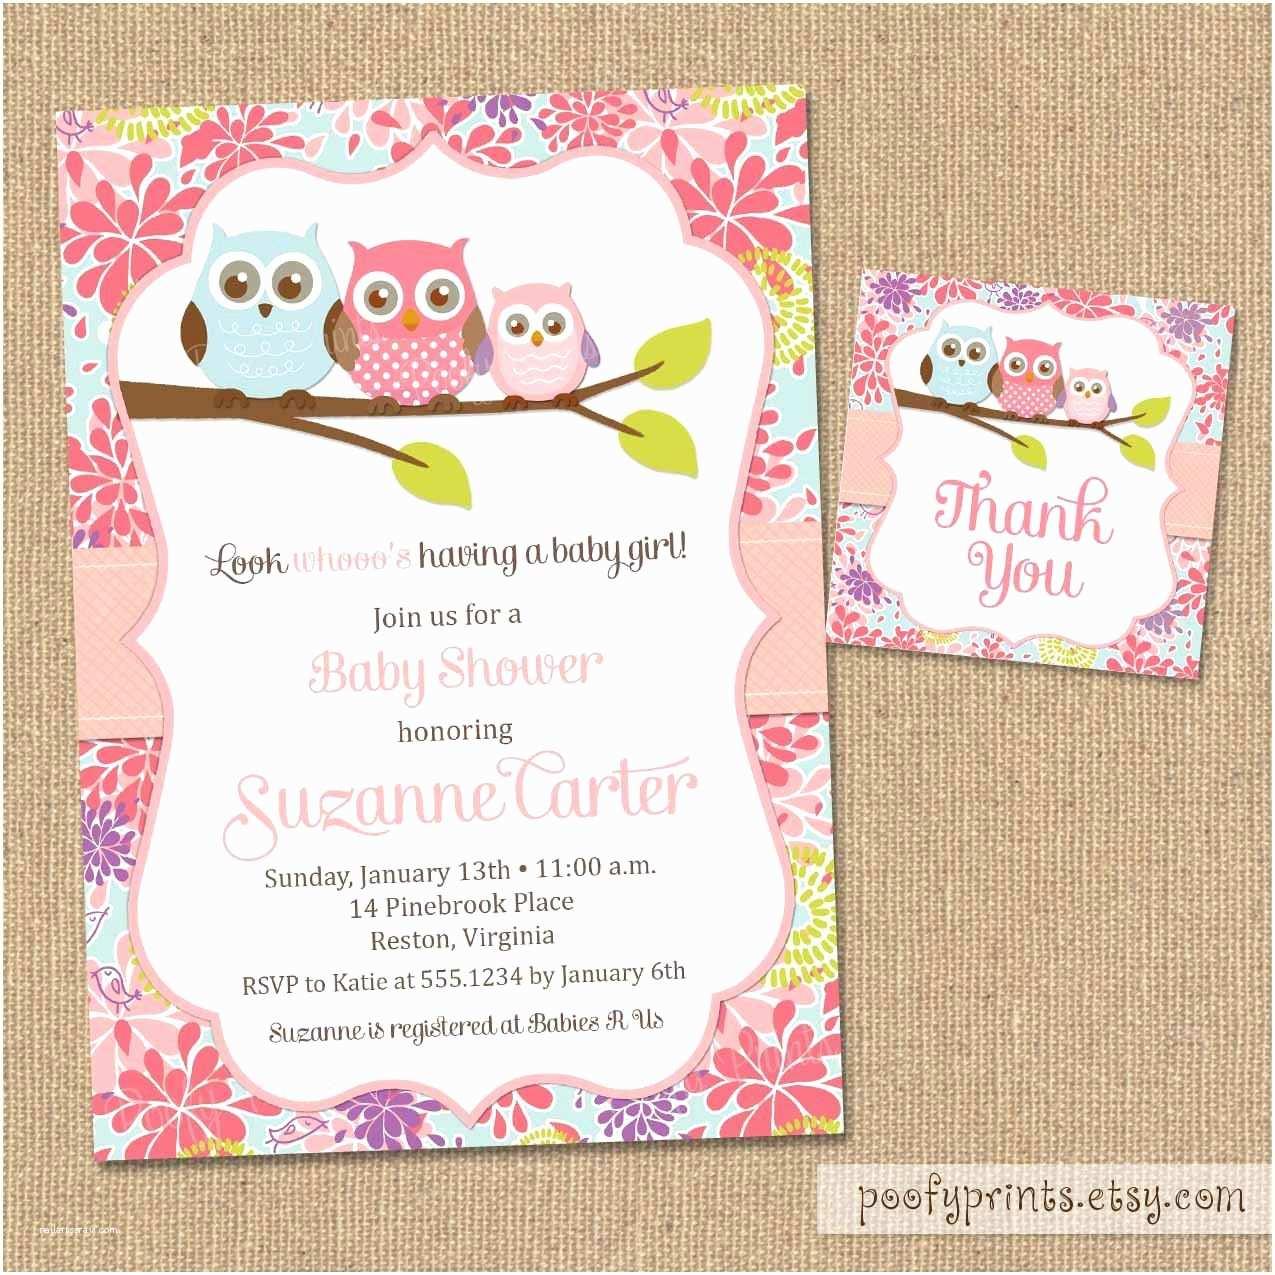 Baby Shower Invitations Girl Owl Baby Shower Invitations Diy Printable Baby Girl